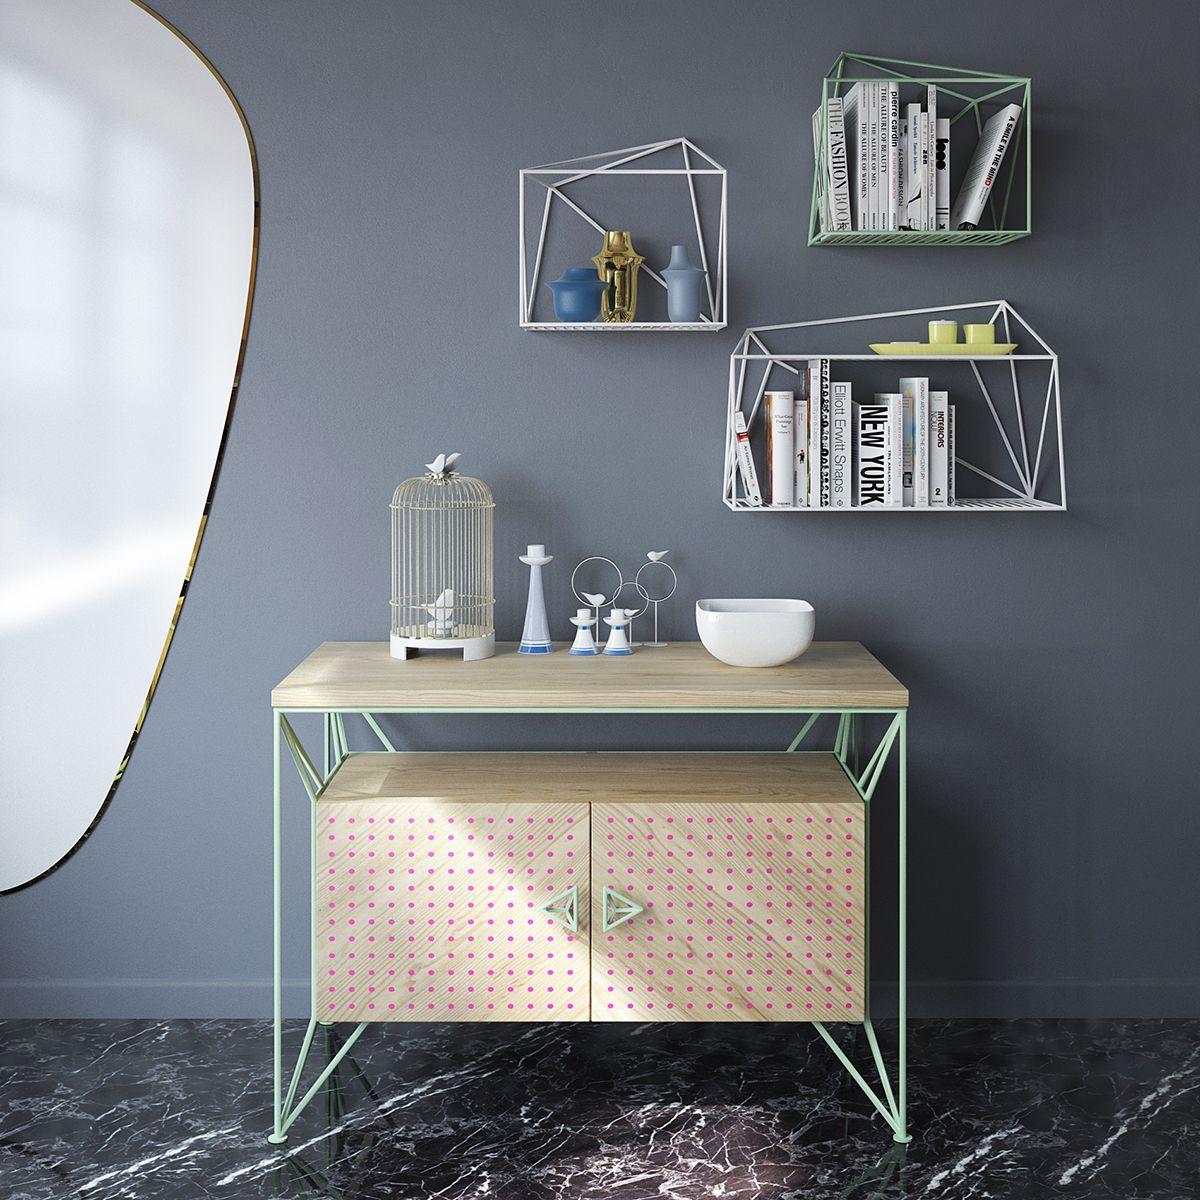 Markers on behance muebles pinterest industrial - Muebles diseno industrial ...